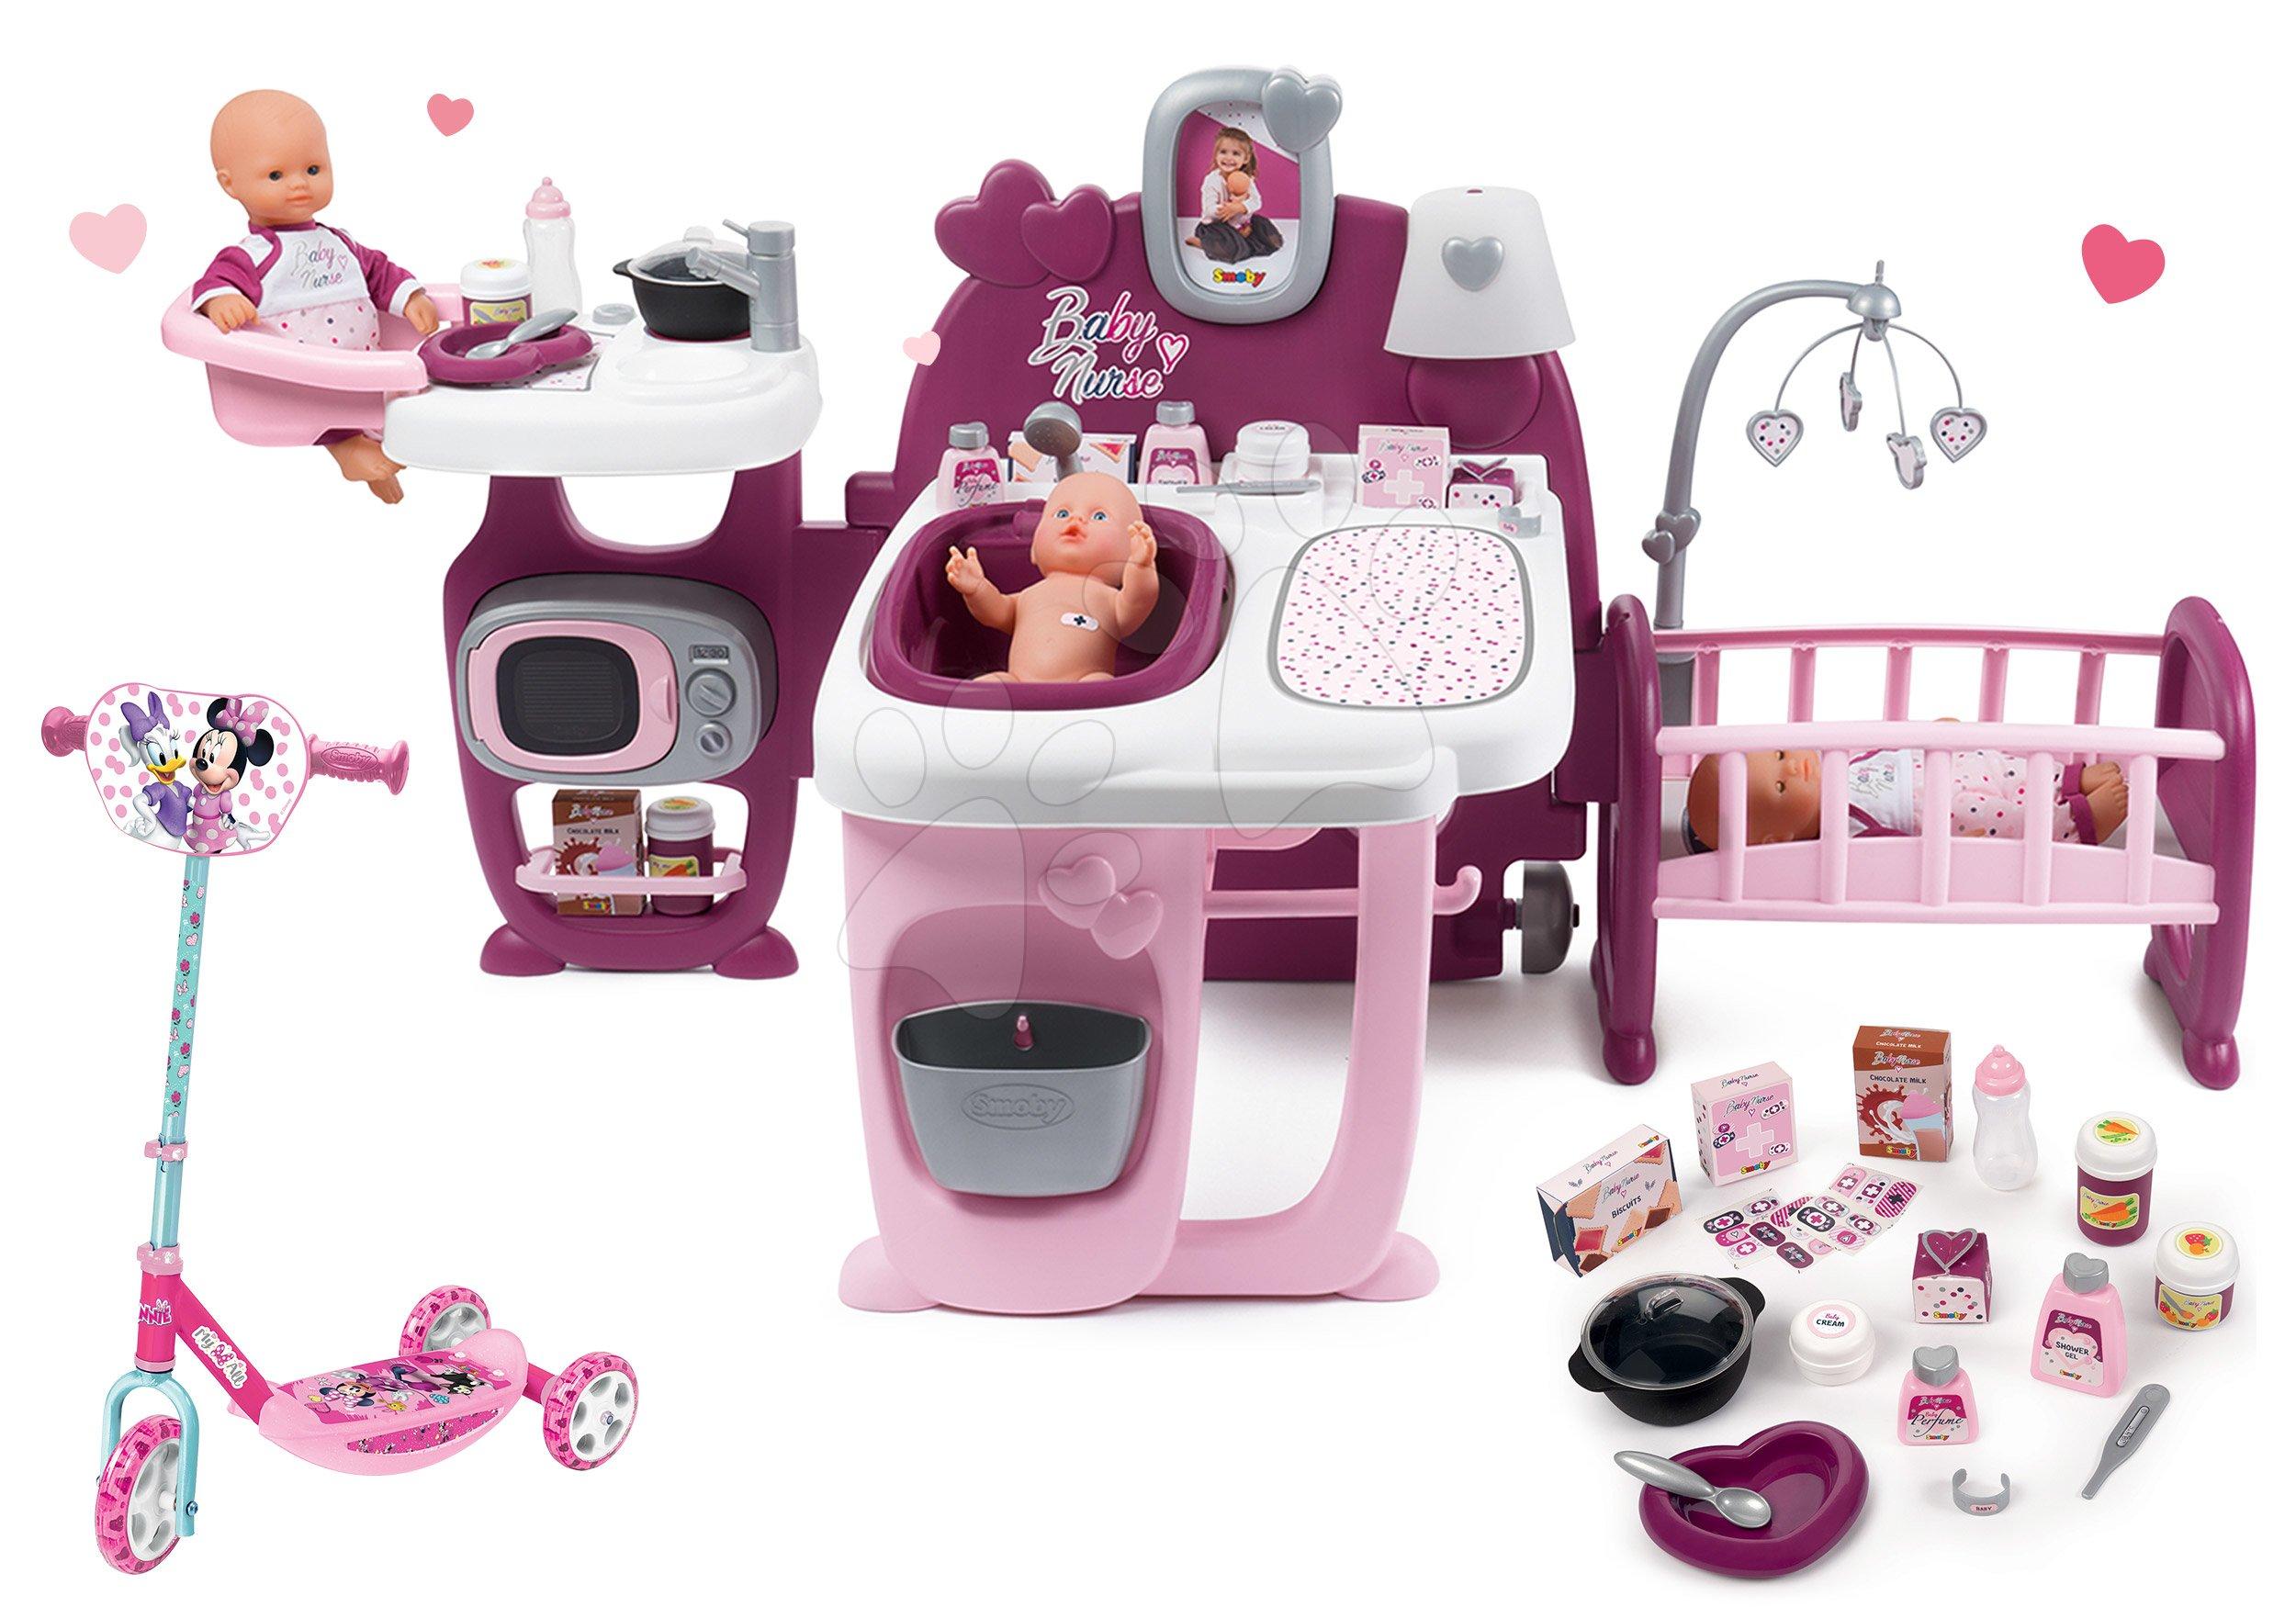 Set domček pre bábiku Violette Baby Nurse Large Doll's Play Center Smoby a kolobežka Disney Minnie trojkolesová